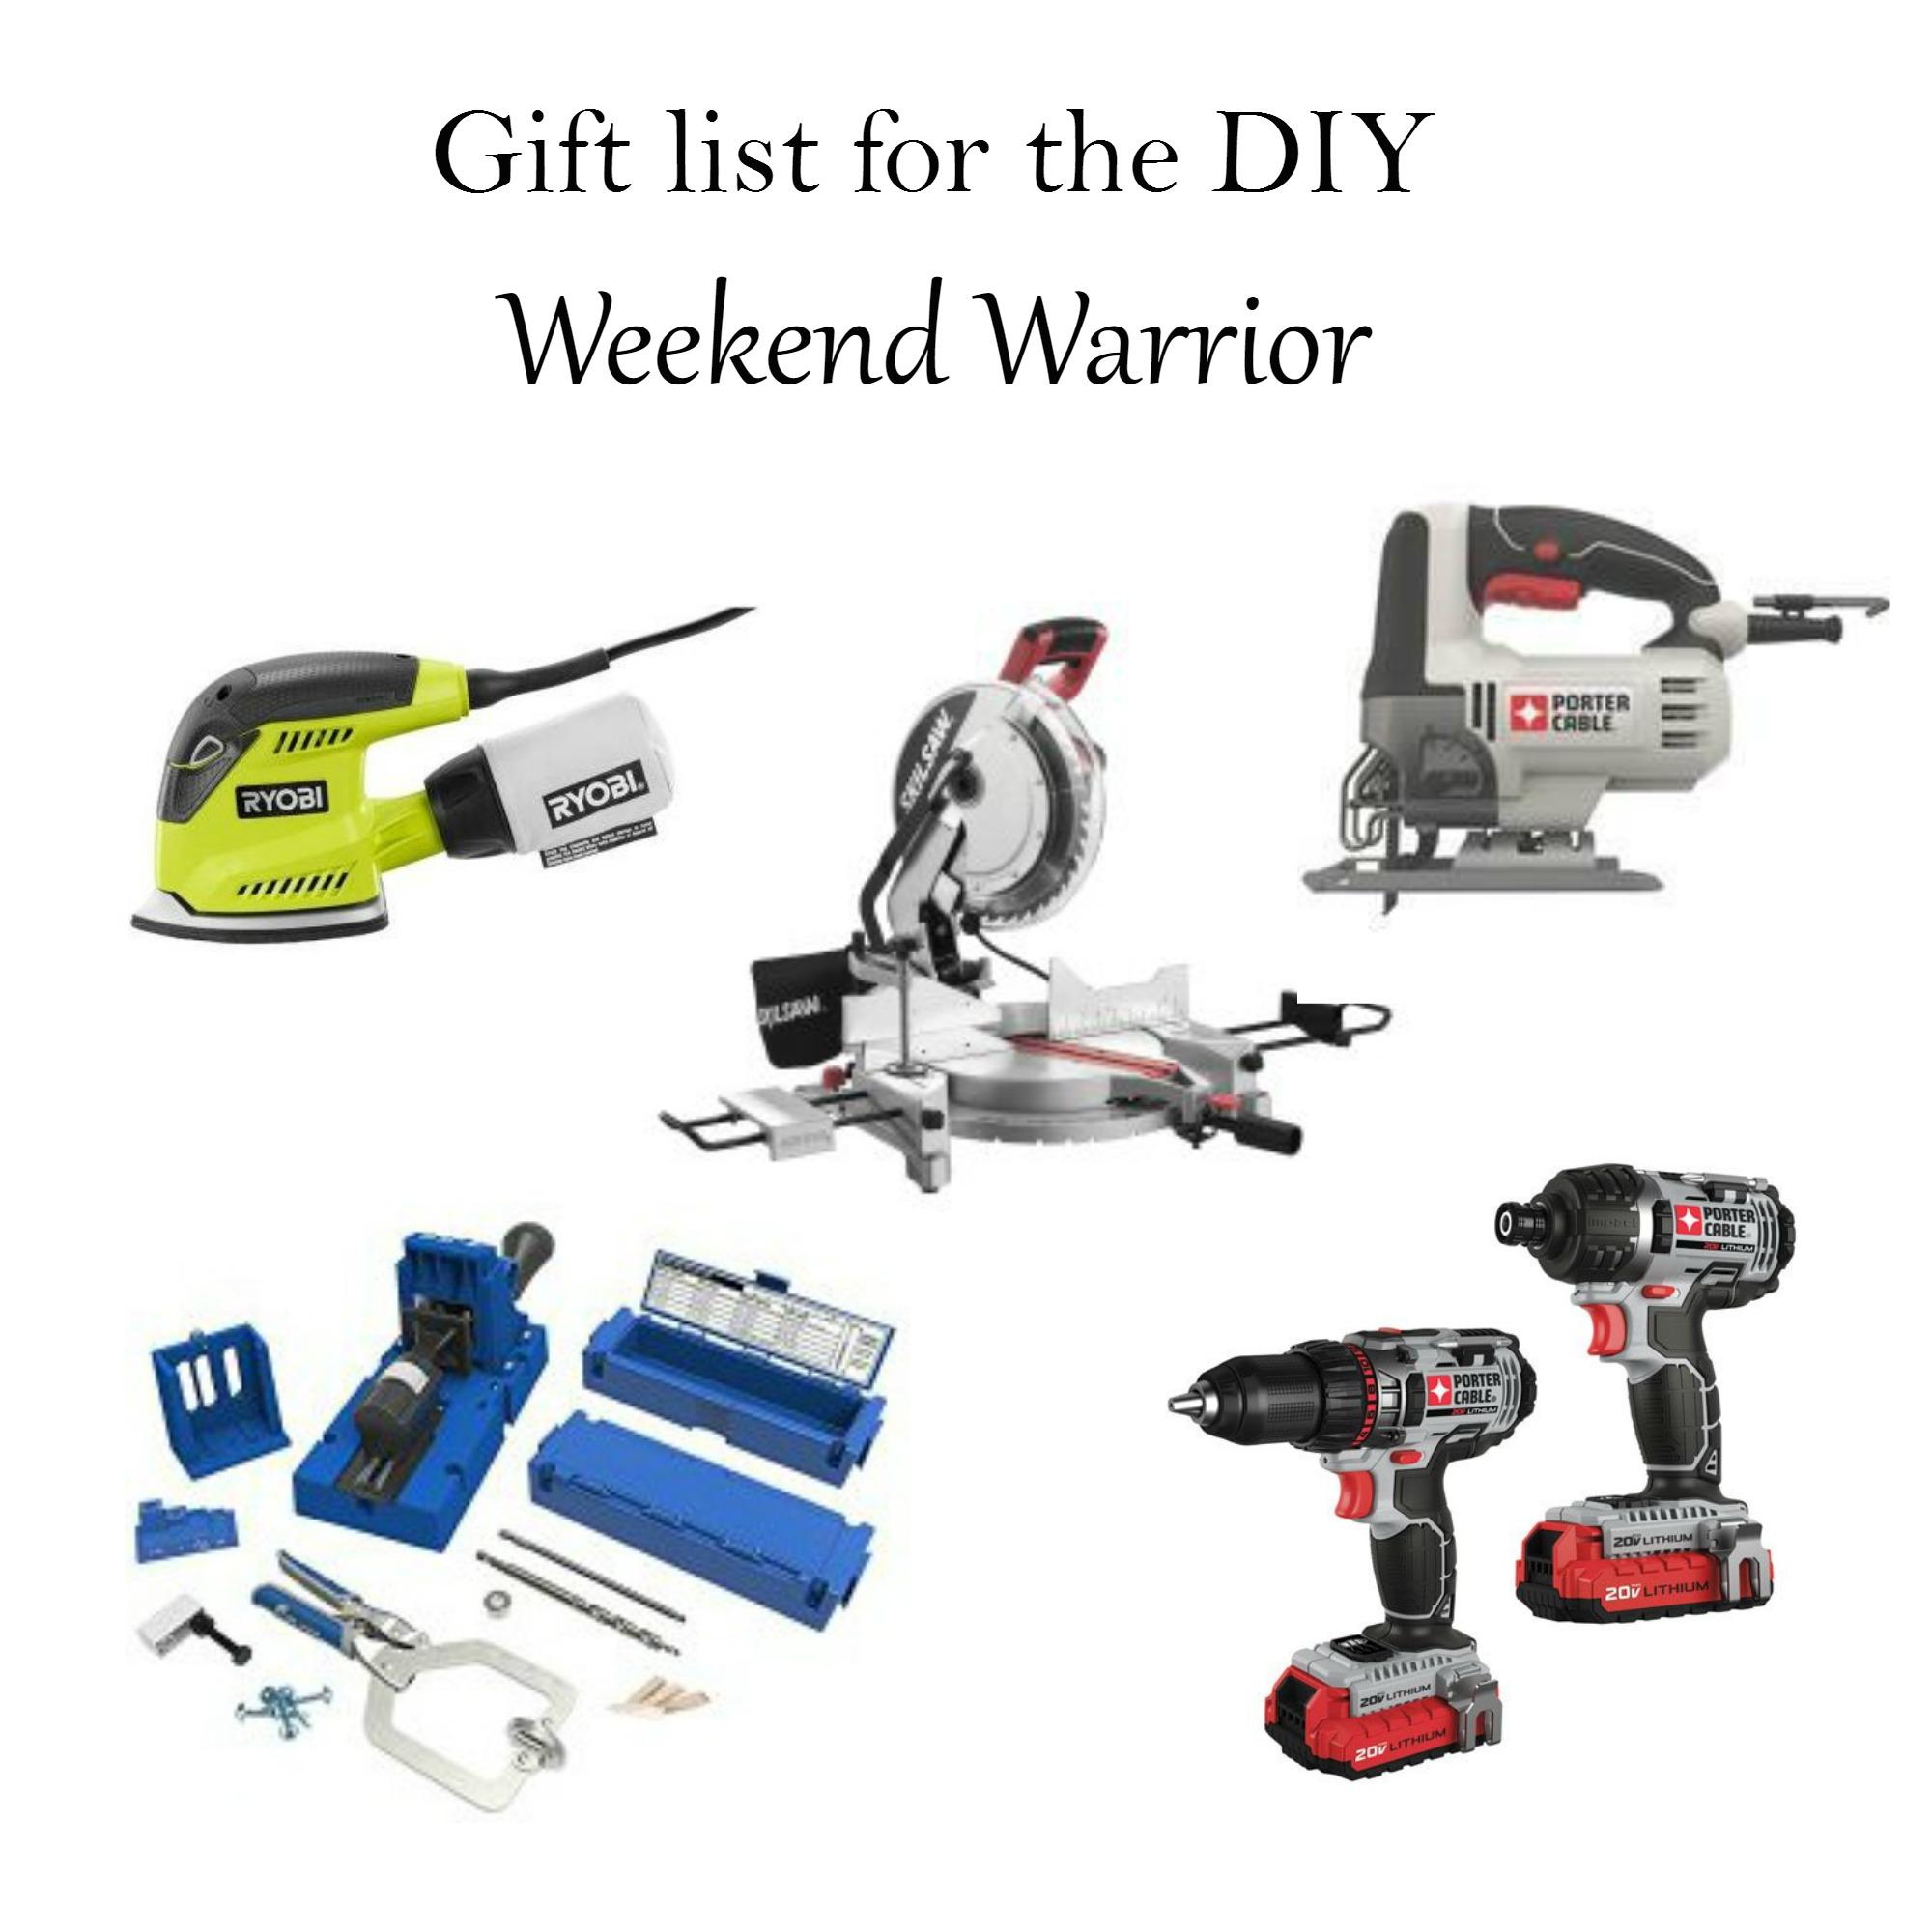 DIY Weekend Warrior